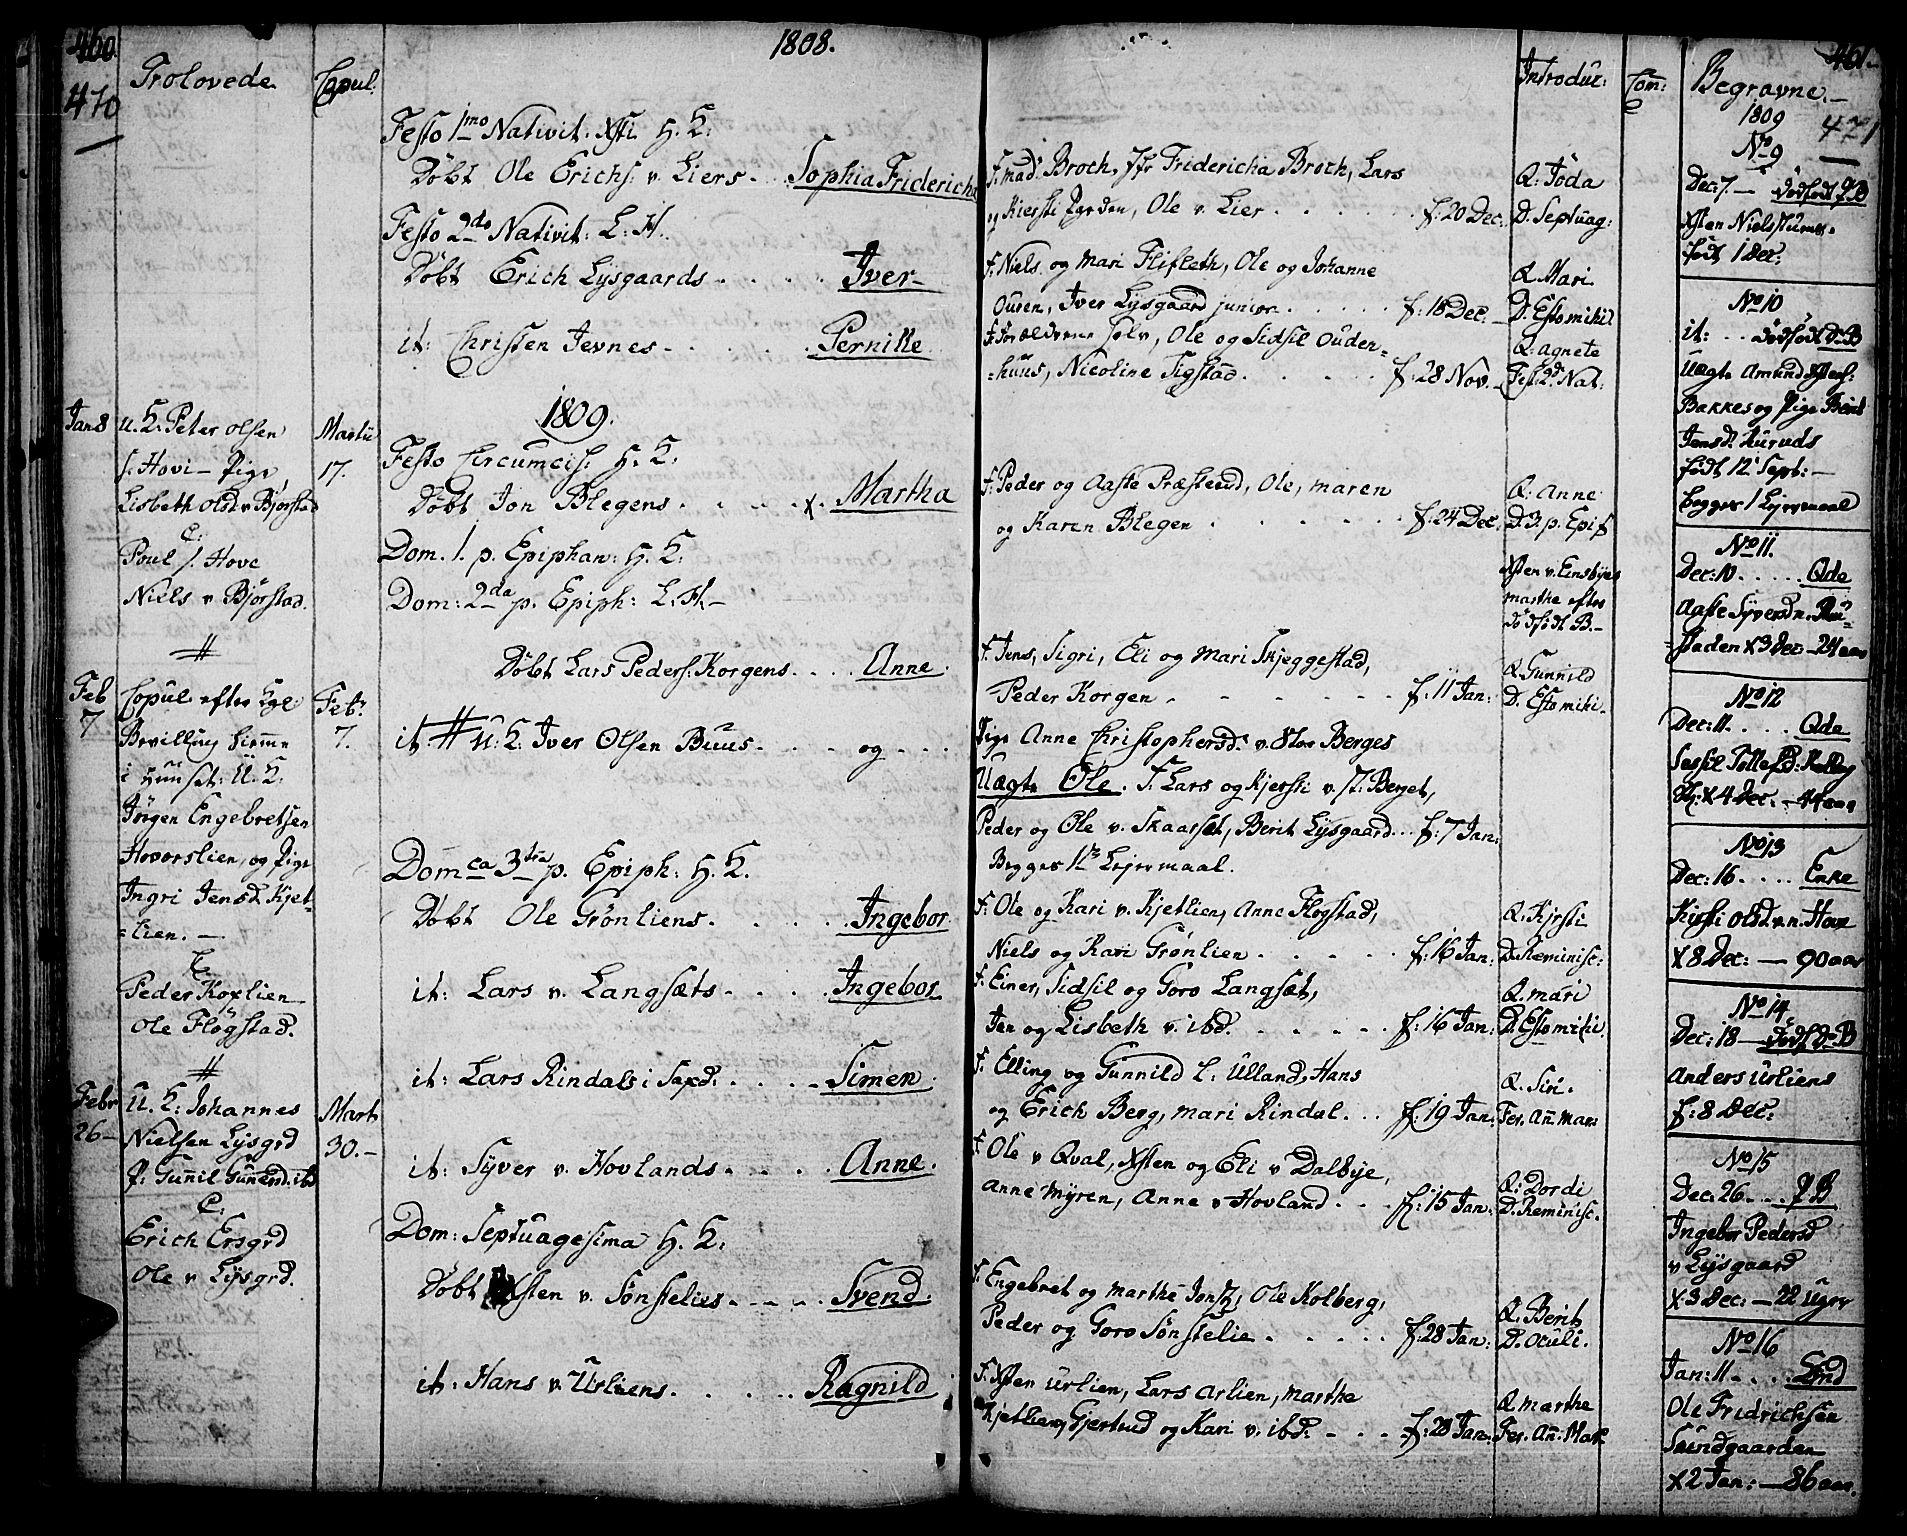 SAH, Fåberg prestekontor, Ministerialbok nr. 2, 1775-1818, s. 470-471